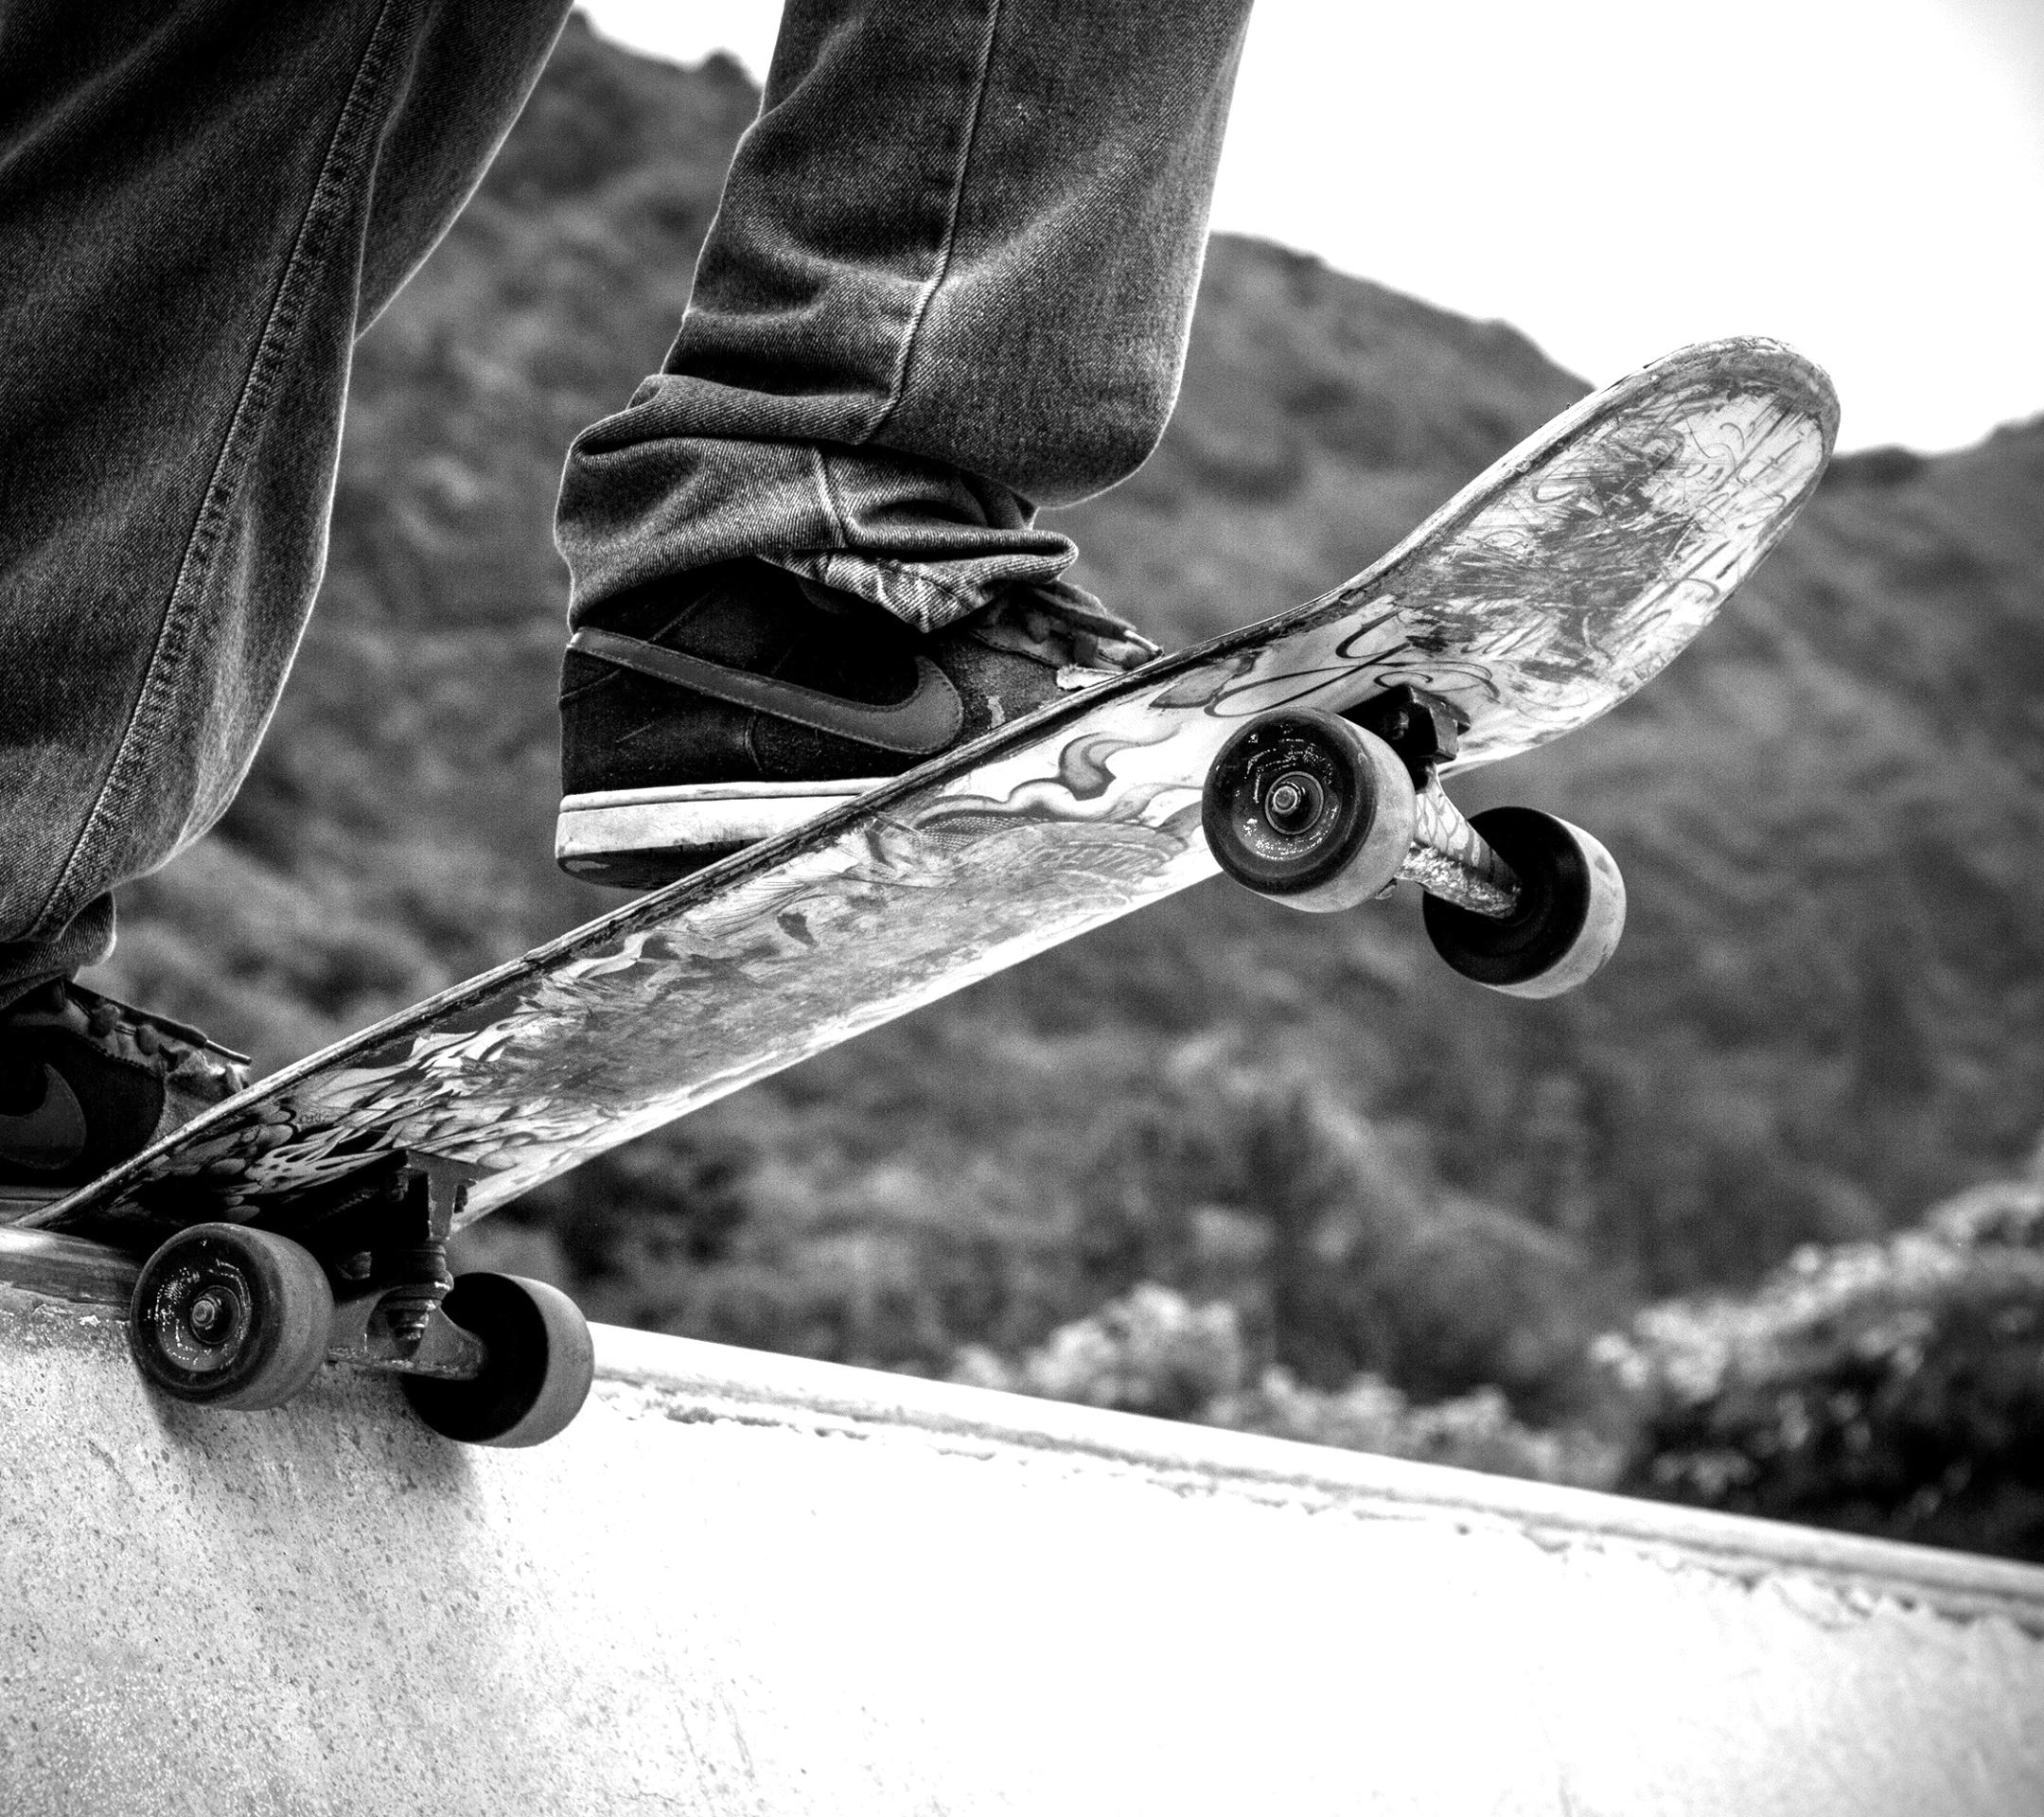 skateboarding wallpaper 53 wallpapers � hd wallpapers